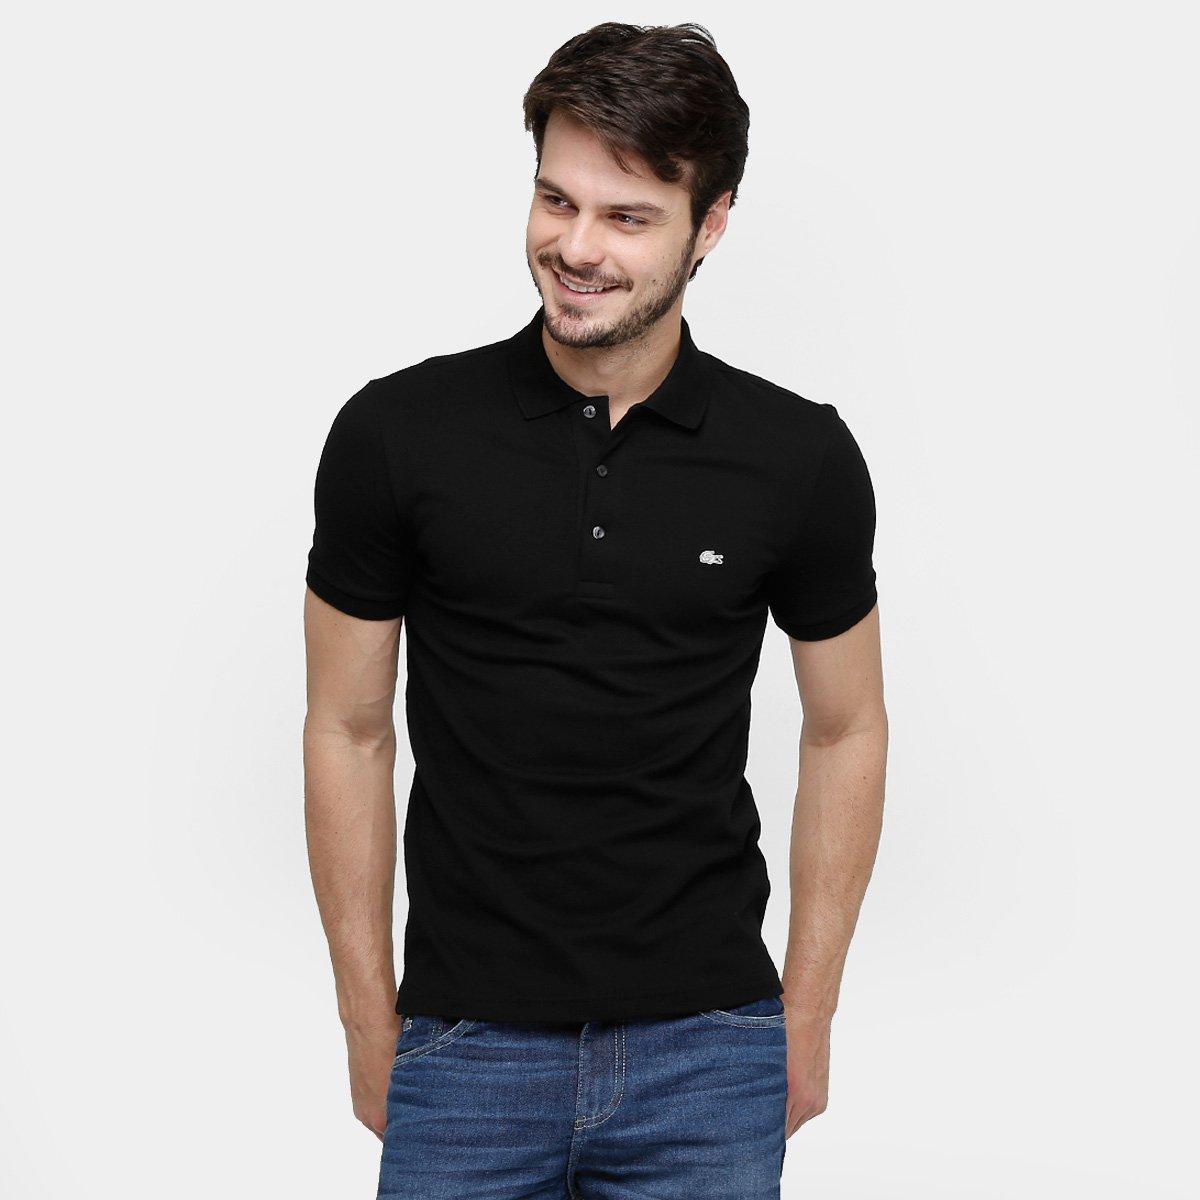 81ffc091f83c3 Camisa Polo Lacoste Piquet Slim Masculina - Preto - Compre Agora ...